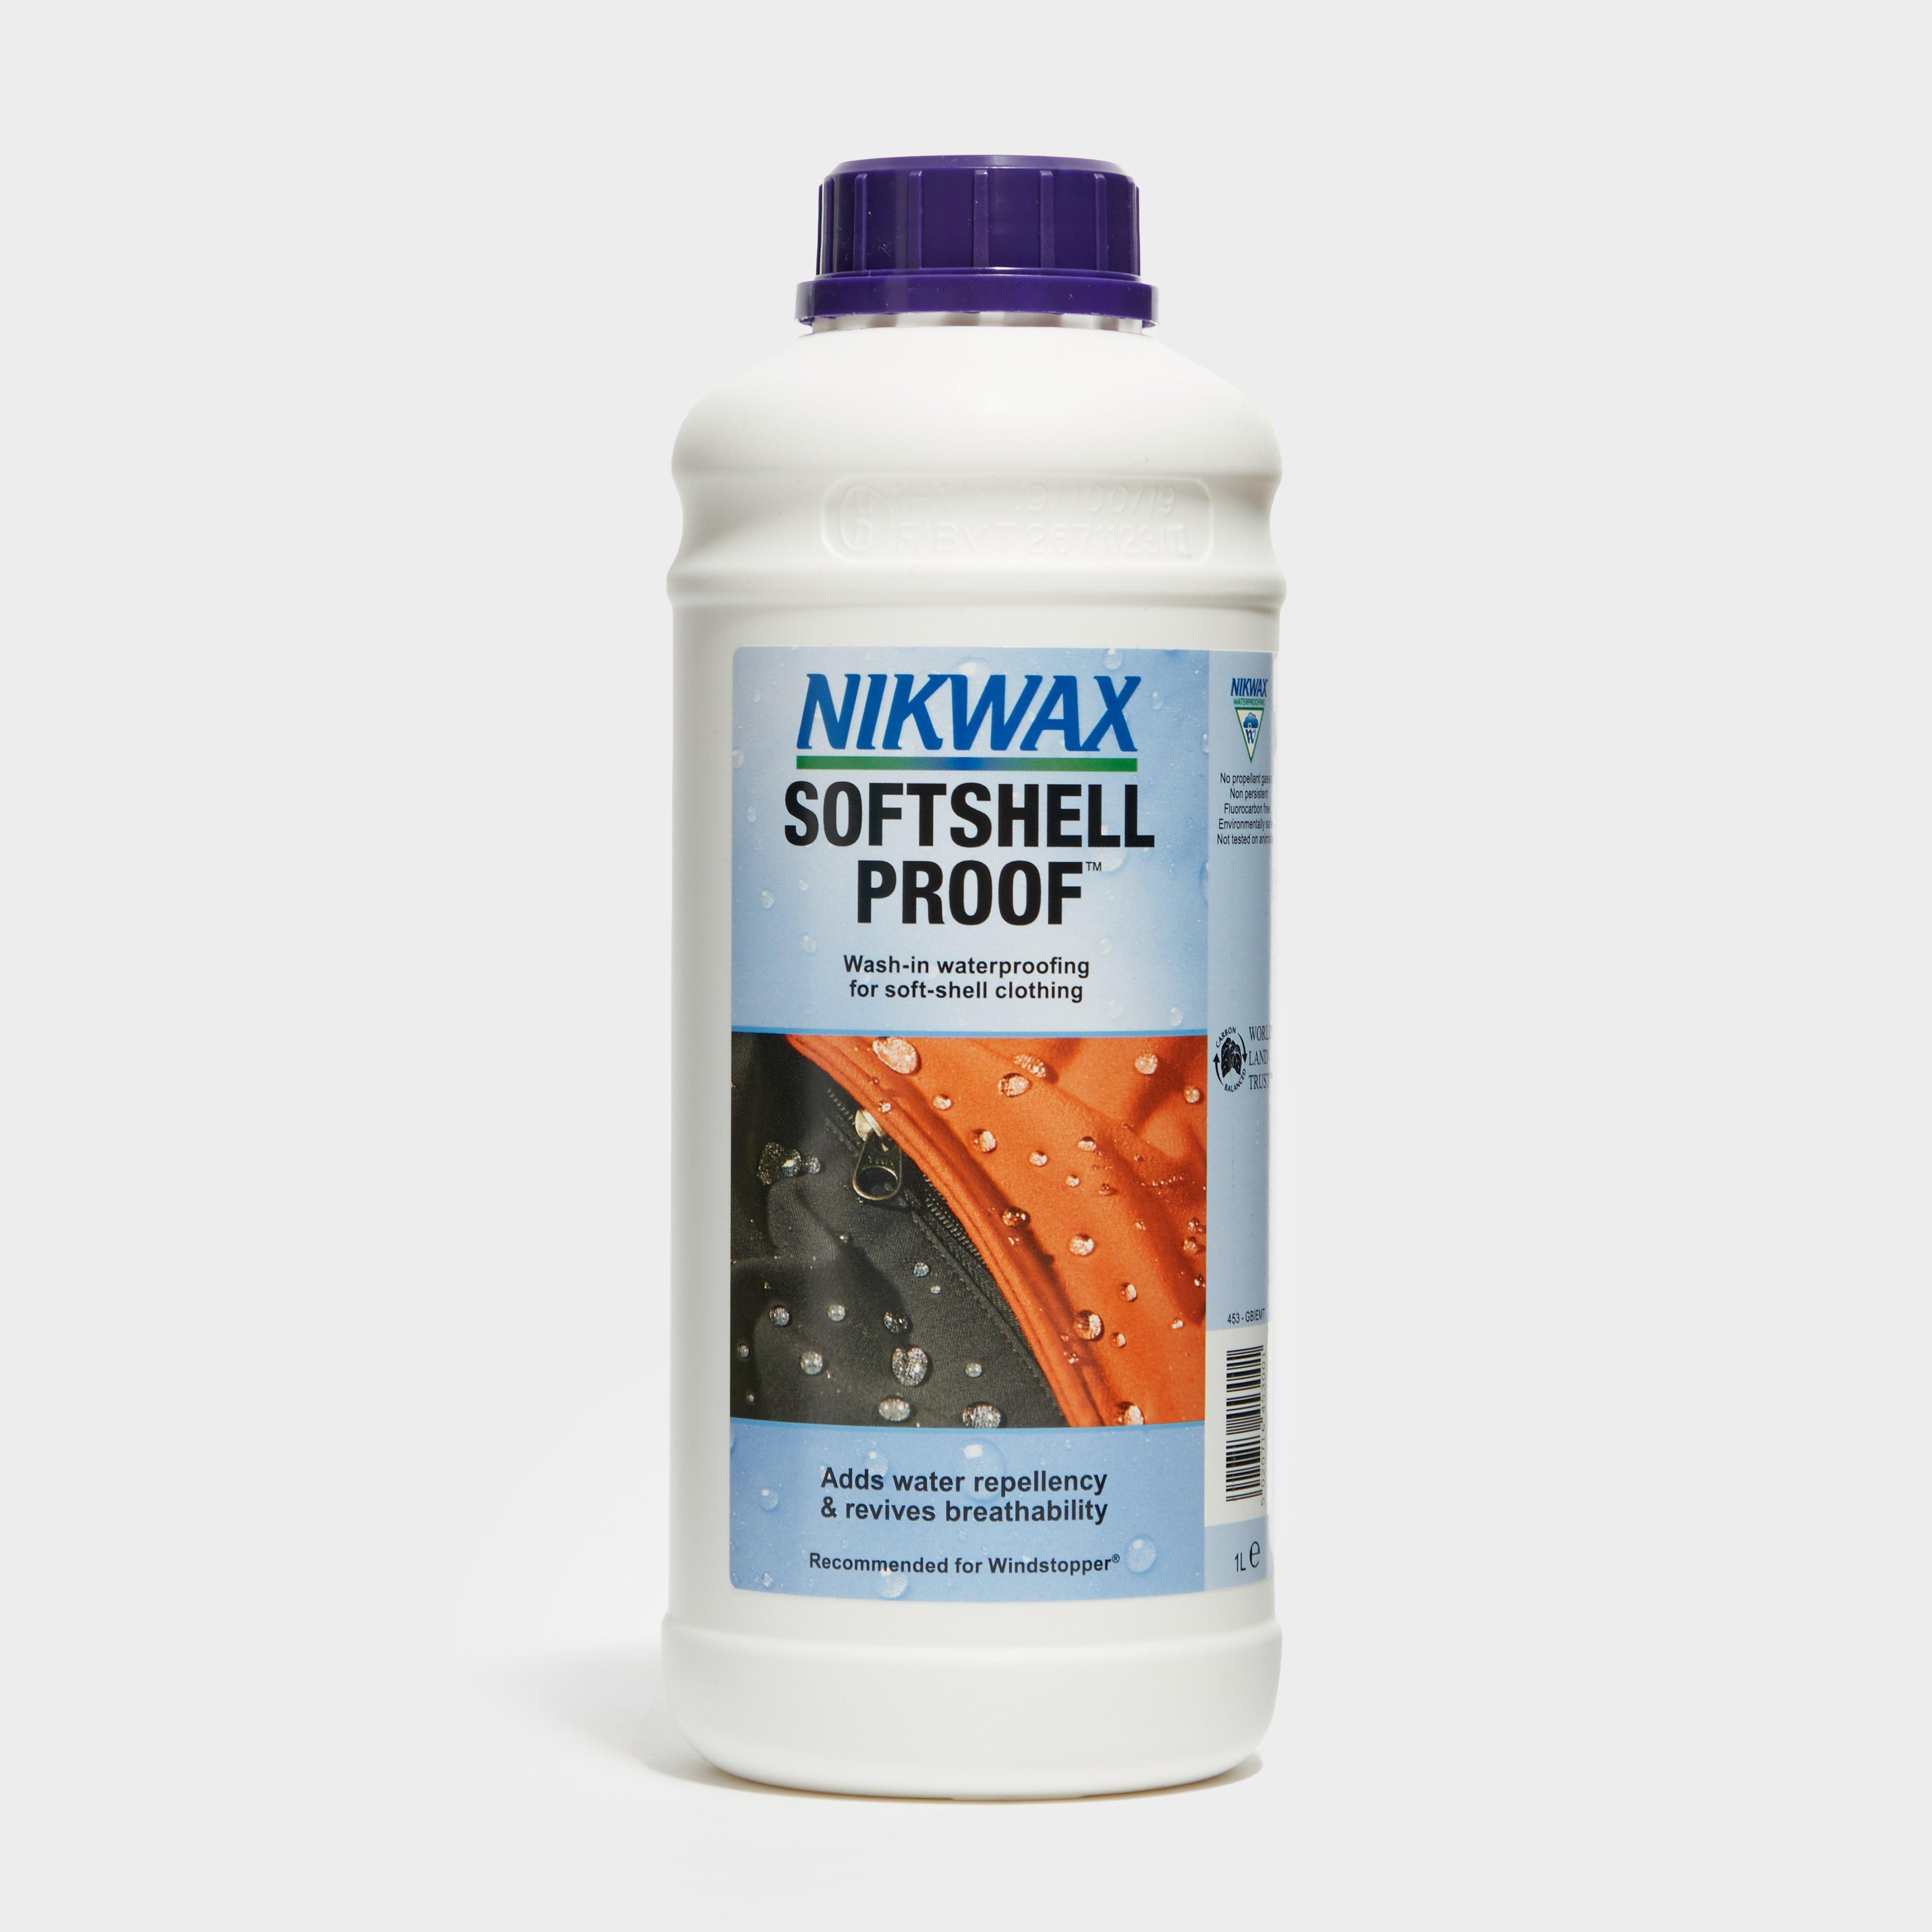 Image of Nikwax Softshell Proof 1L - Blue/1L, Blue/1L